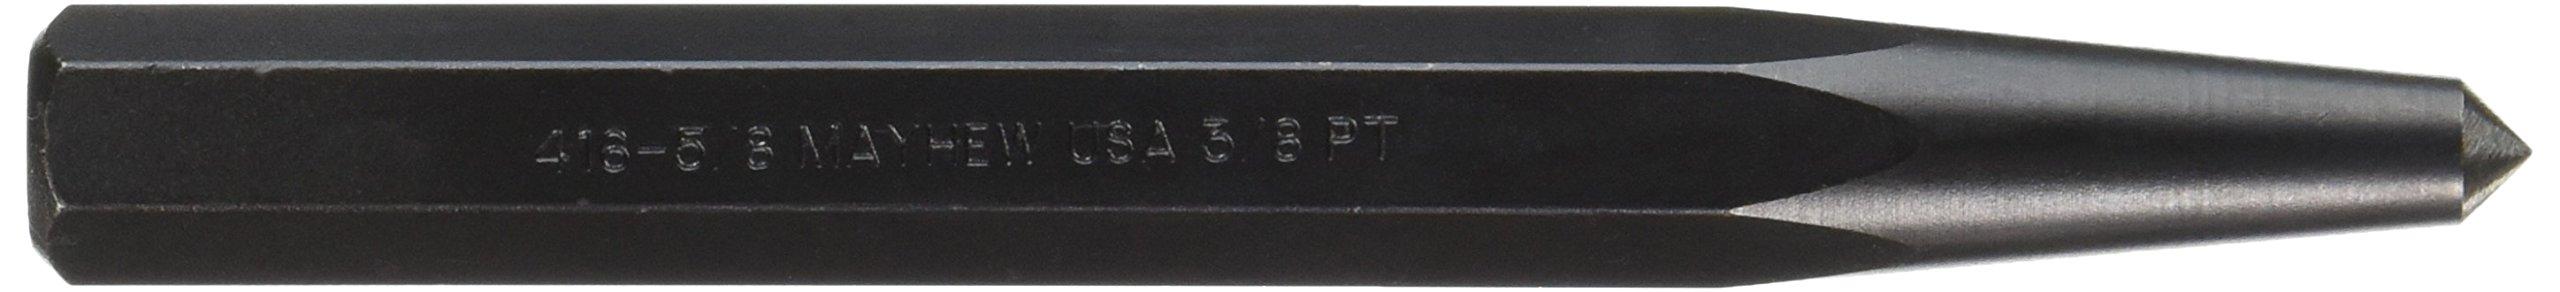 Mayhew Pro 24004 5/8-Inch Center Punch